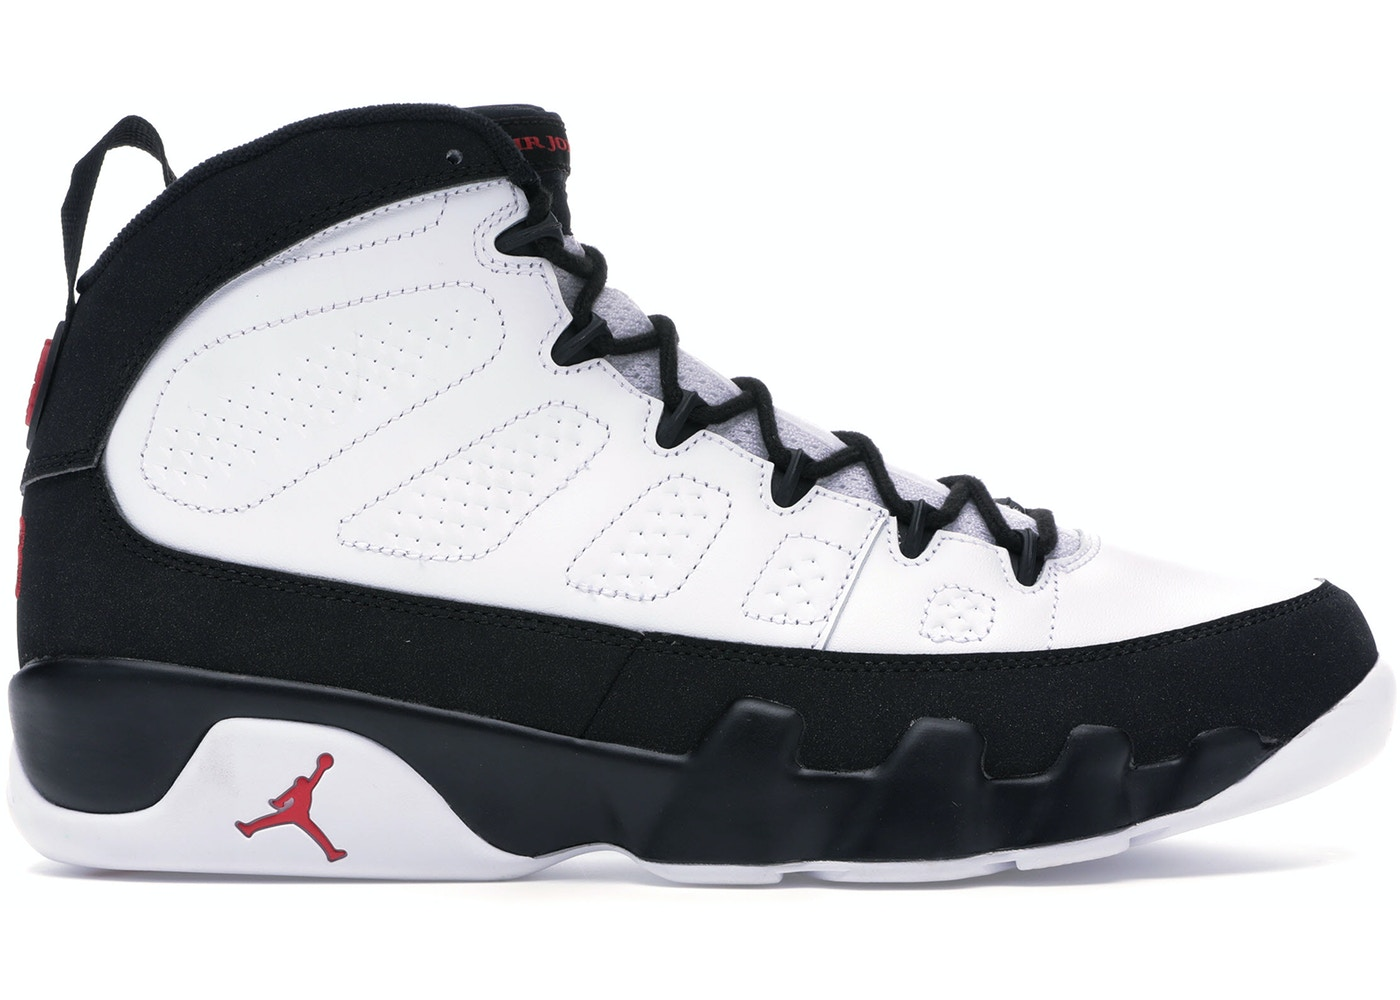 on sale 5a453 268e5 Buy Air Jordan 9 Shoes & Deadstock Sneakers